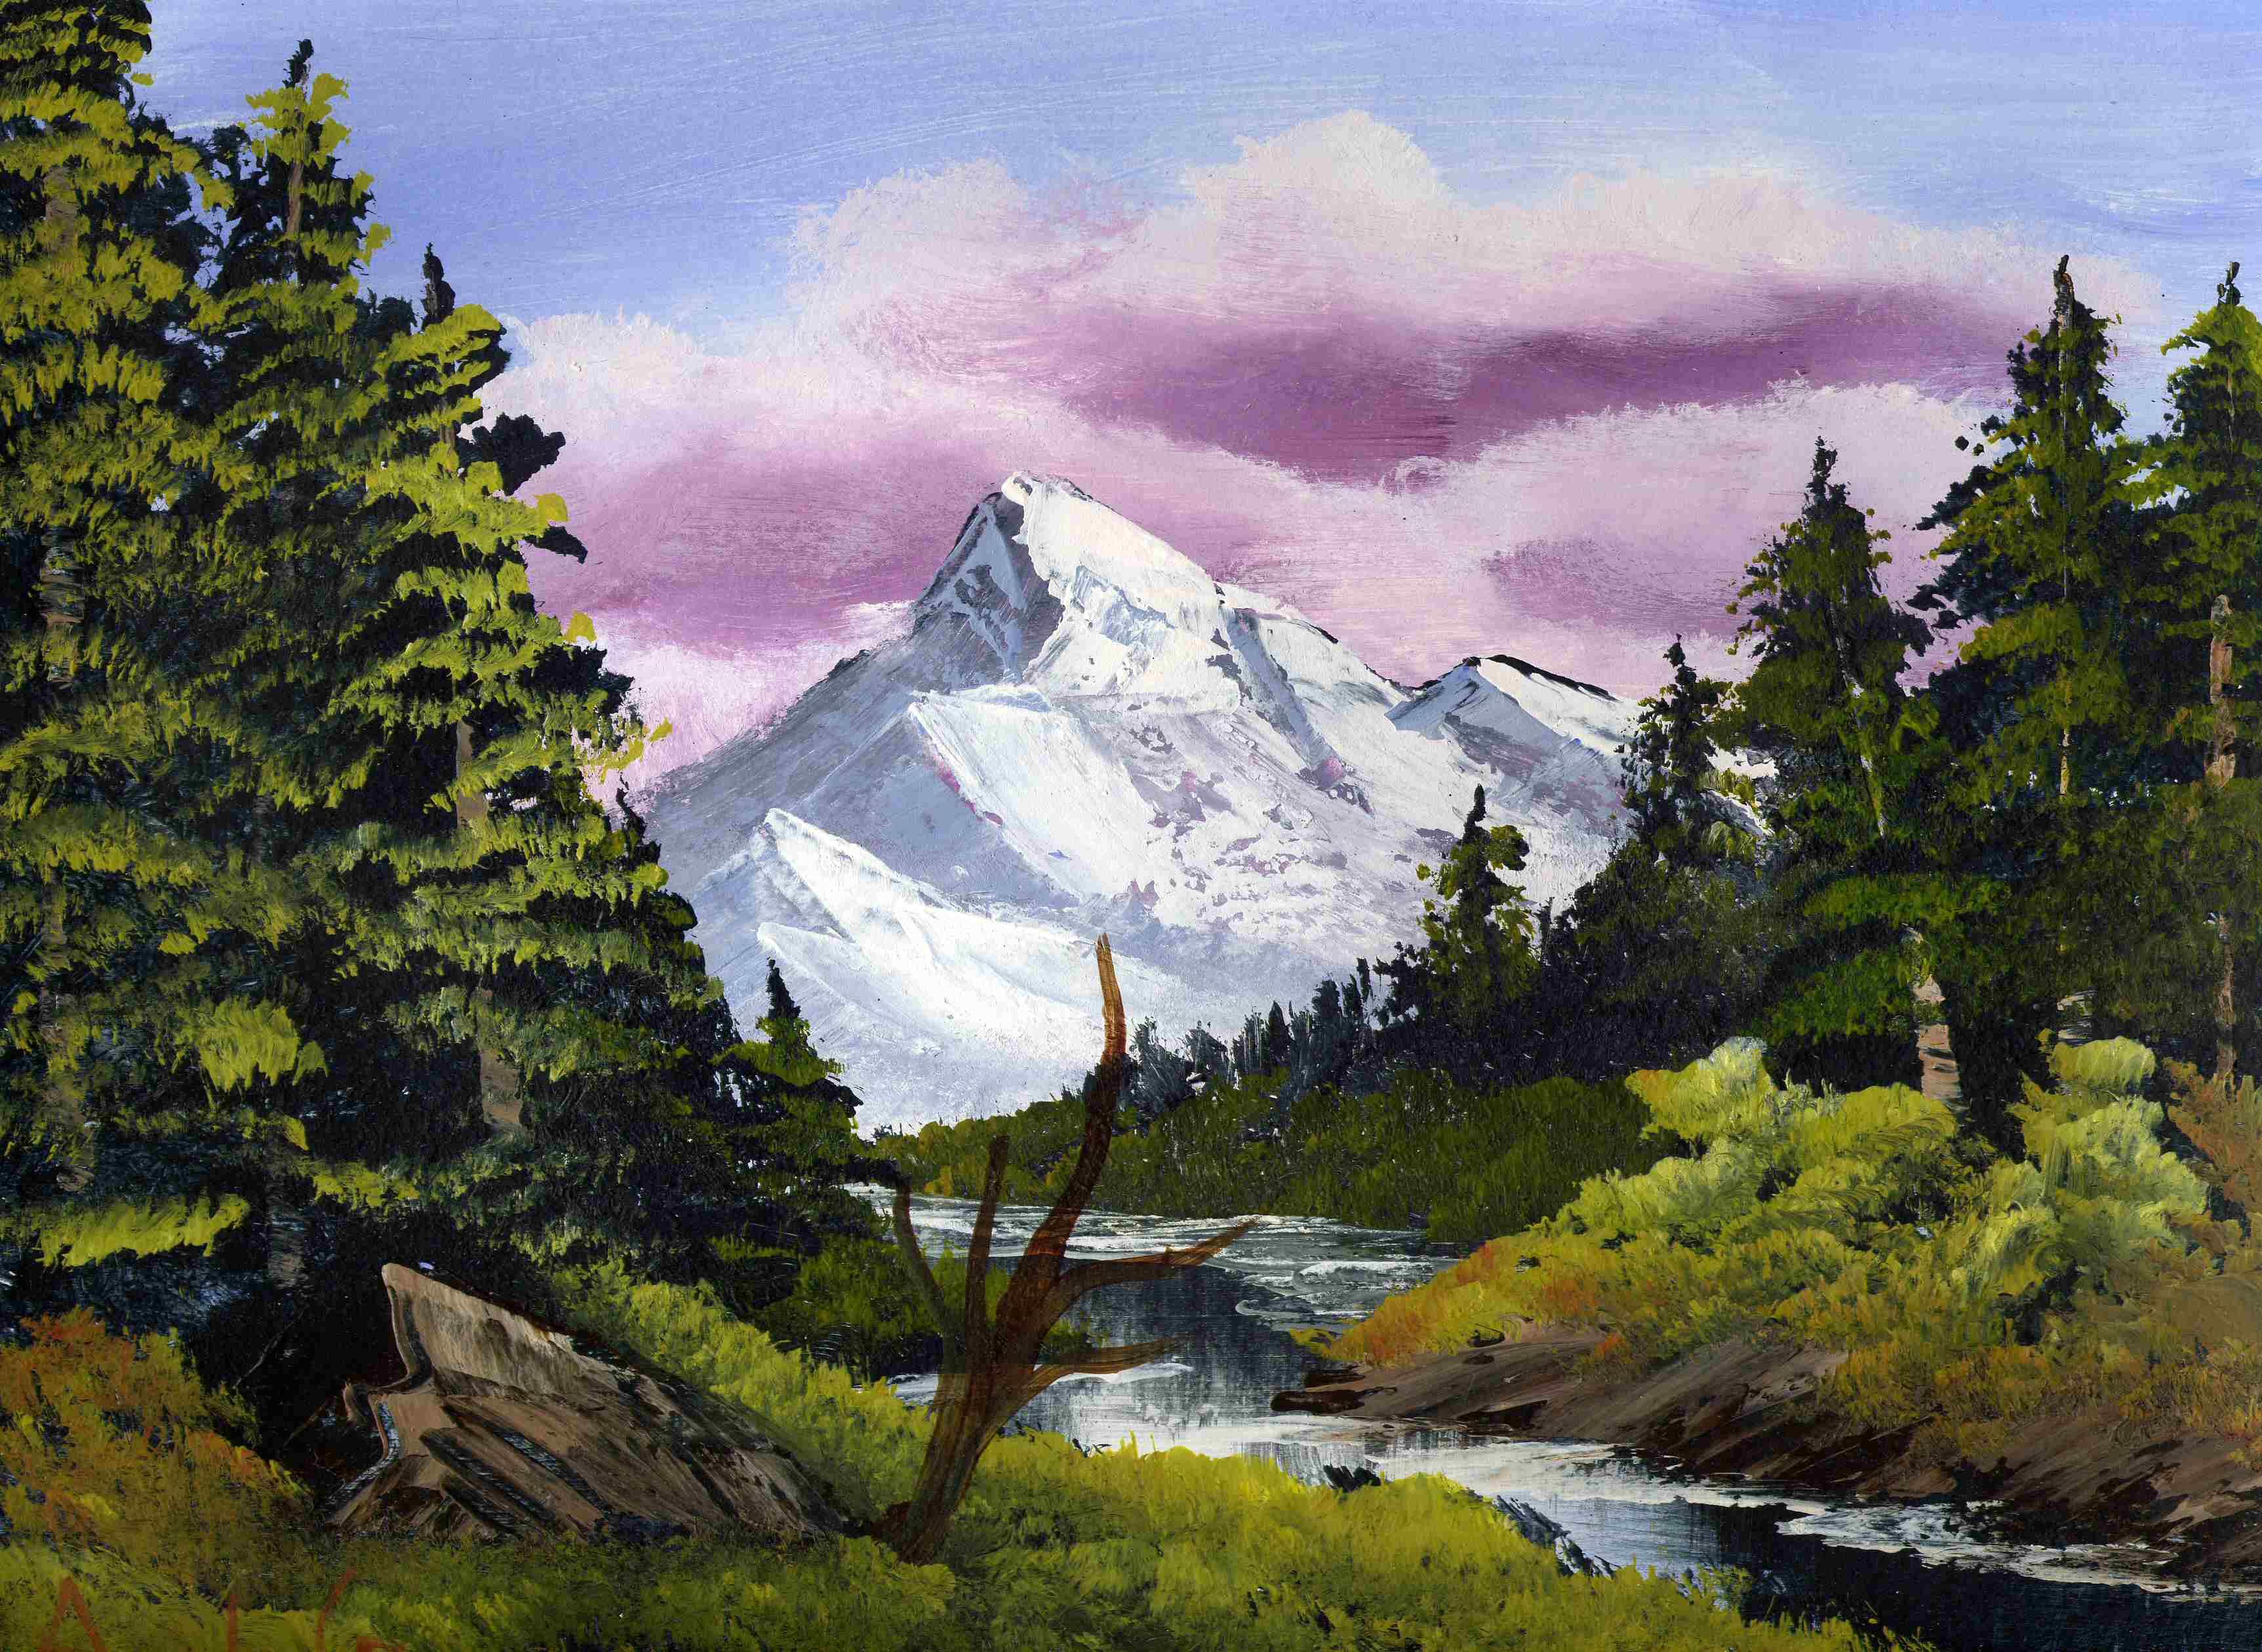 Зима природа, картинка гуашью гора с рекой